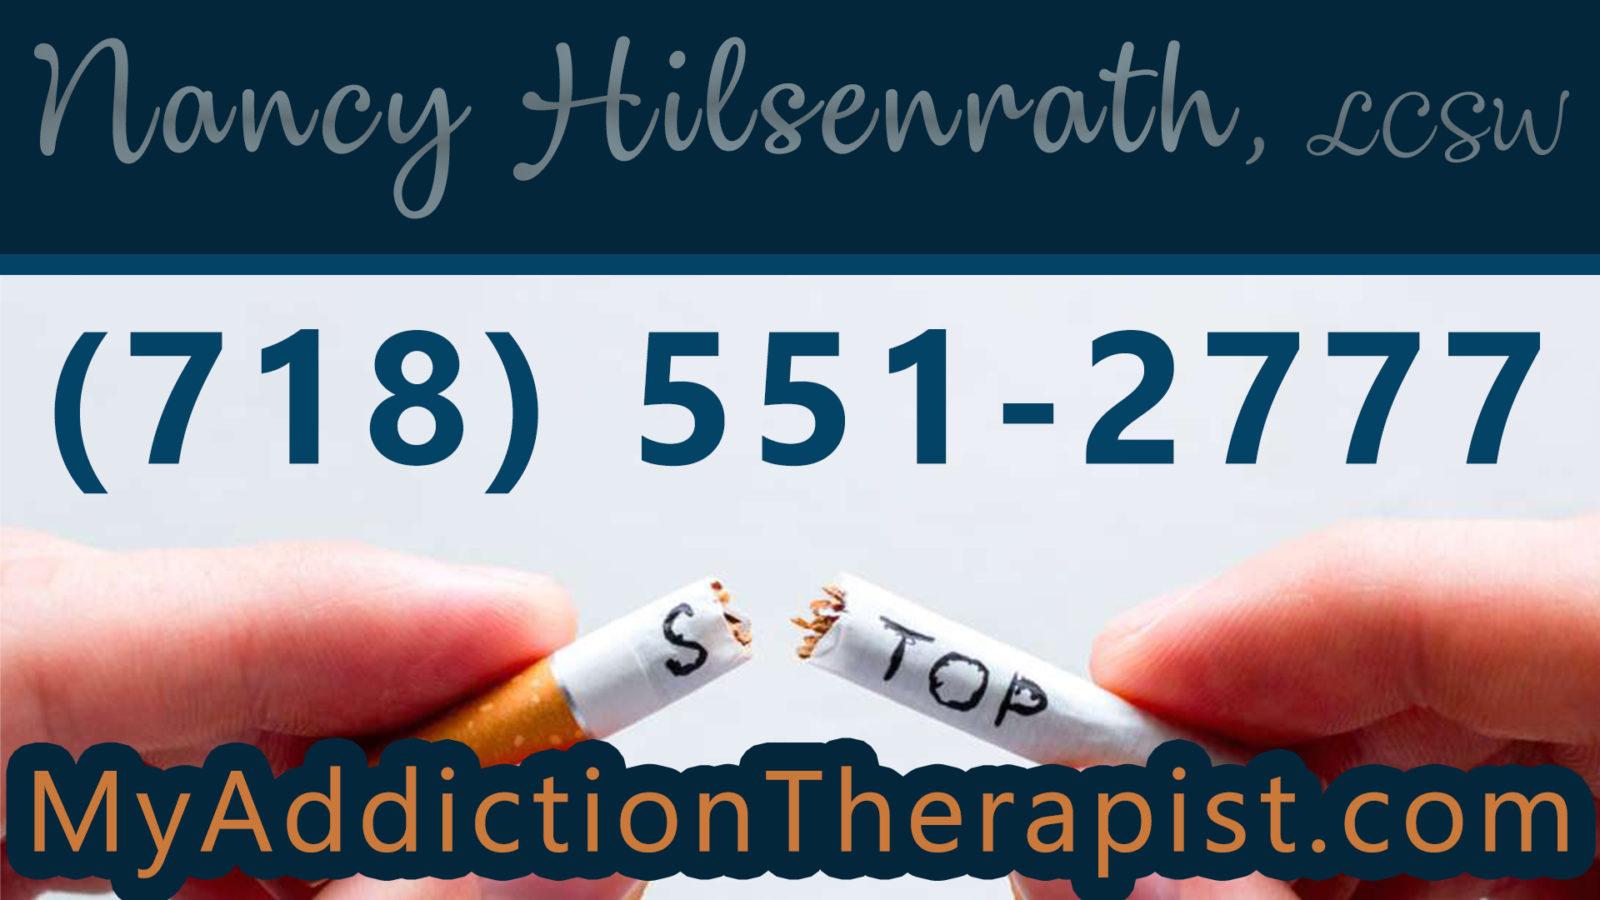 nicotine addiction therapy NY